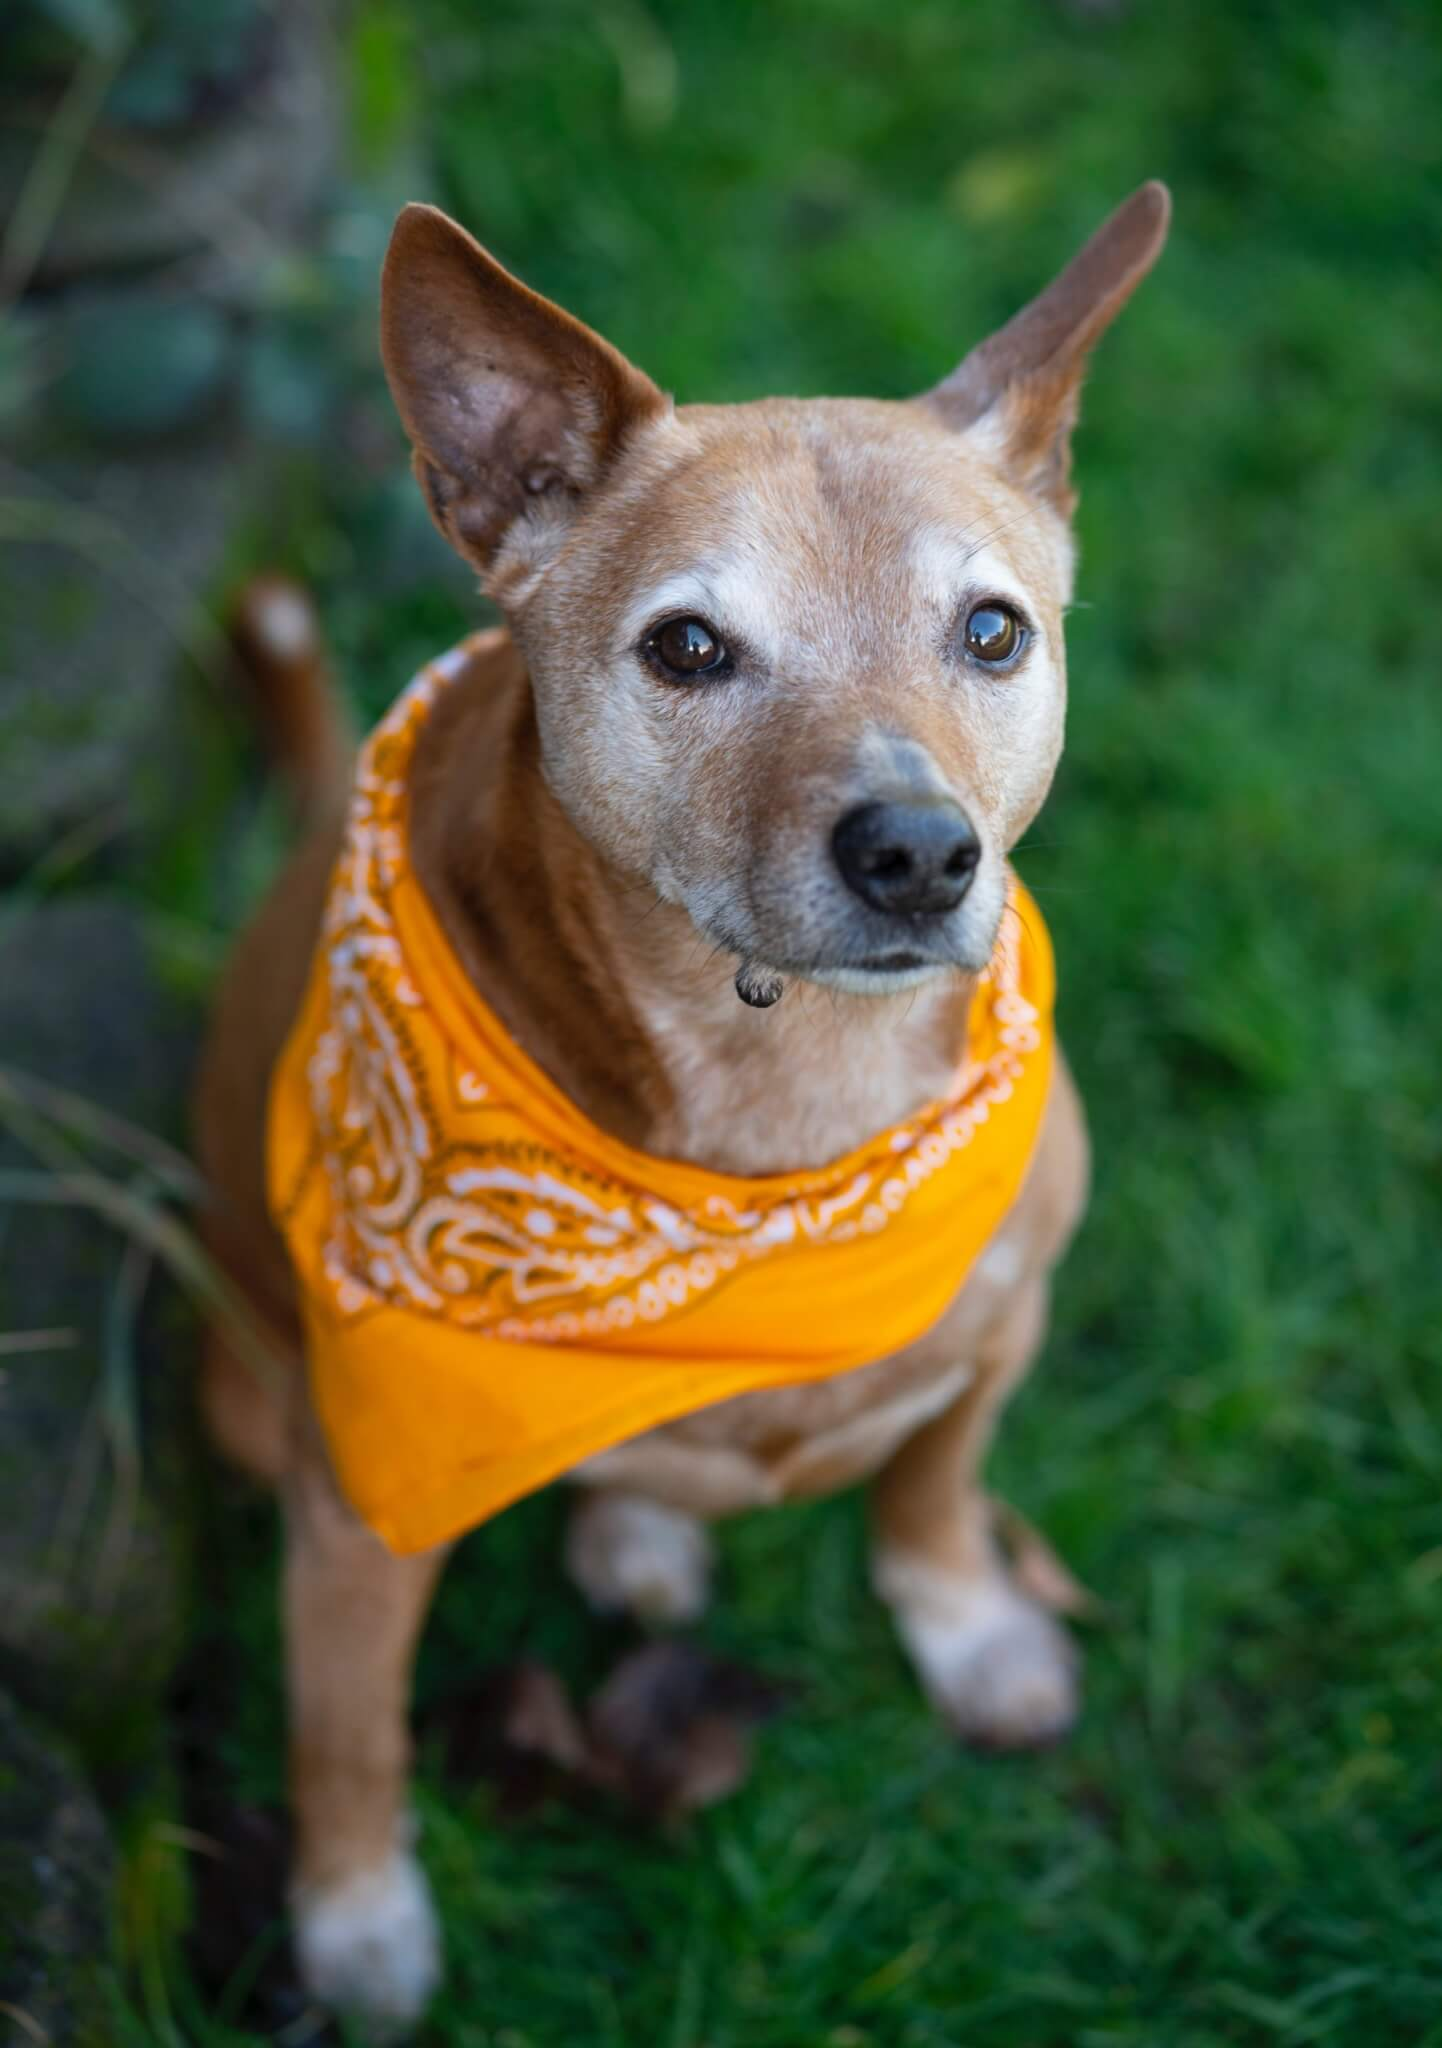 Dog with a bandana.